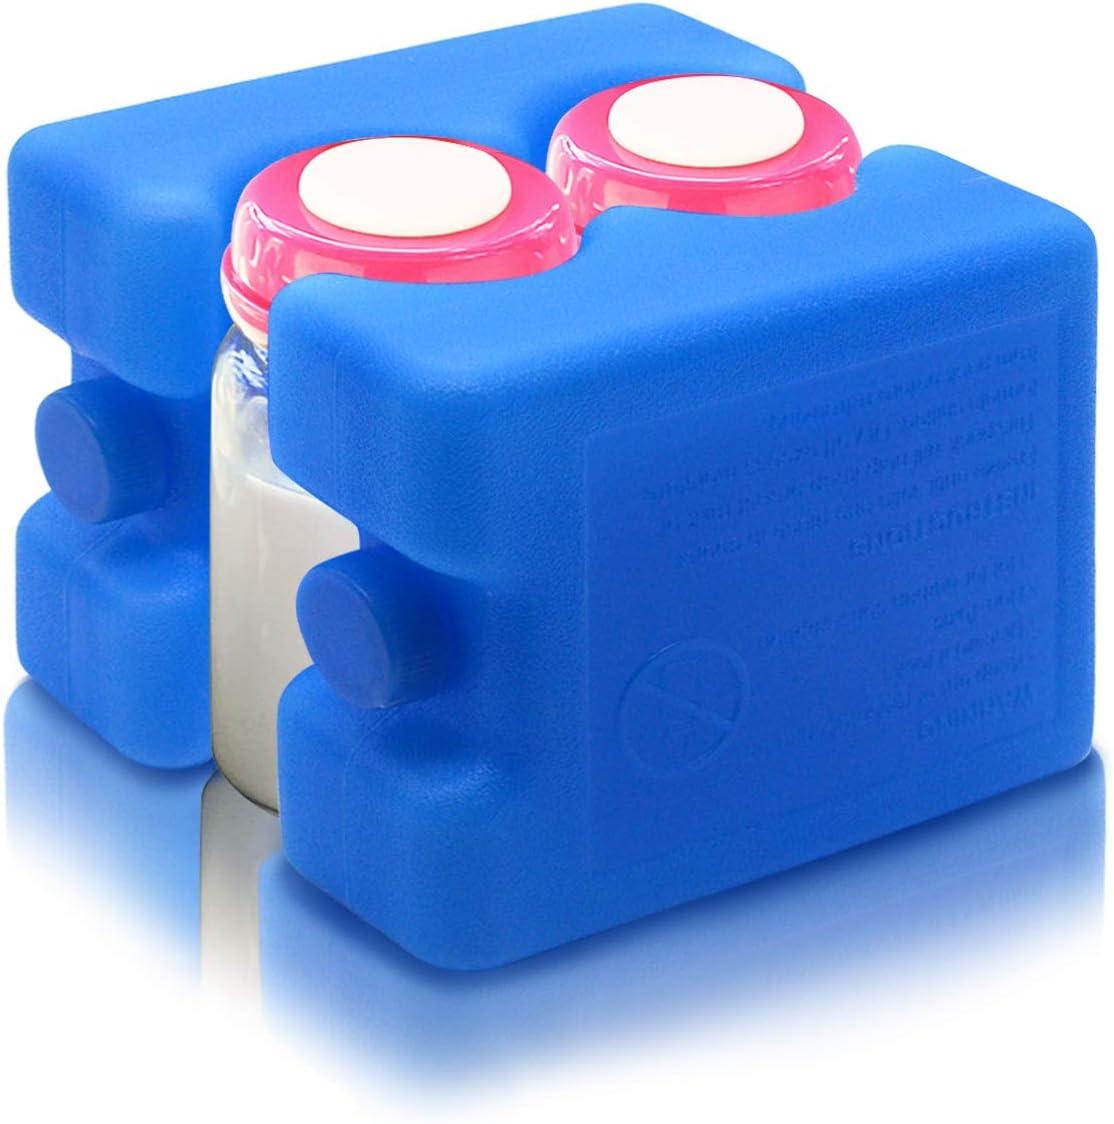 JMEXSUSS Reusable Ice Packs Freezer Packs for Breastmilk Storage,Cool Cooler Bag Baby Bottles(2 Pack) Lunch Breakfast